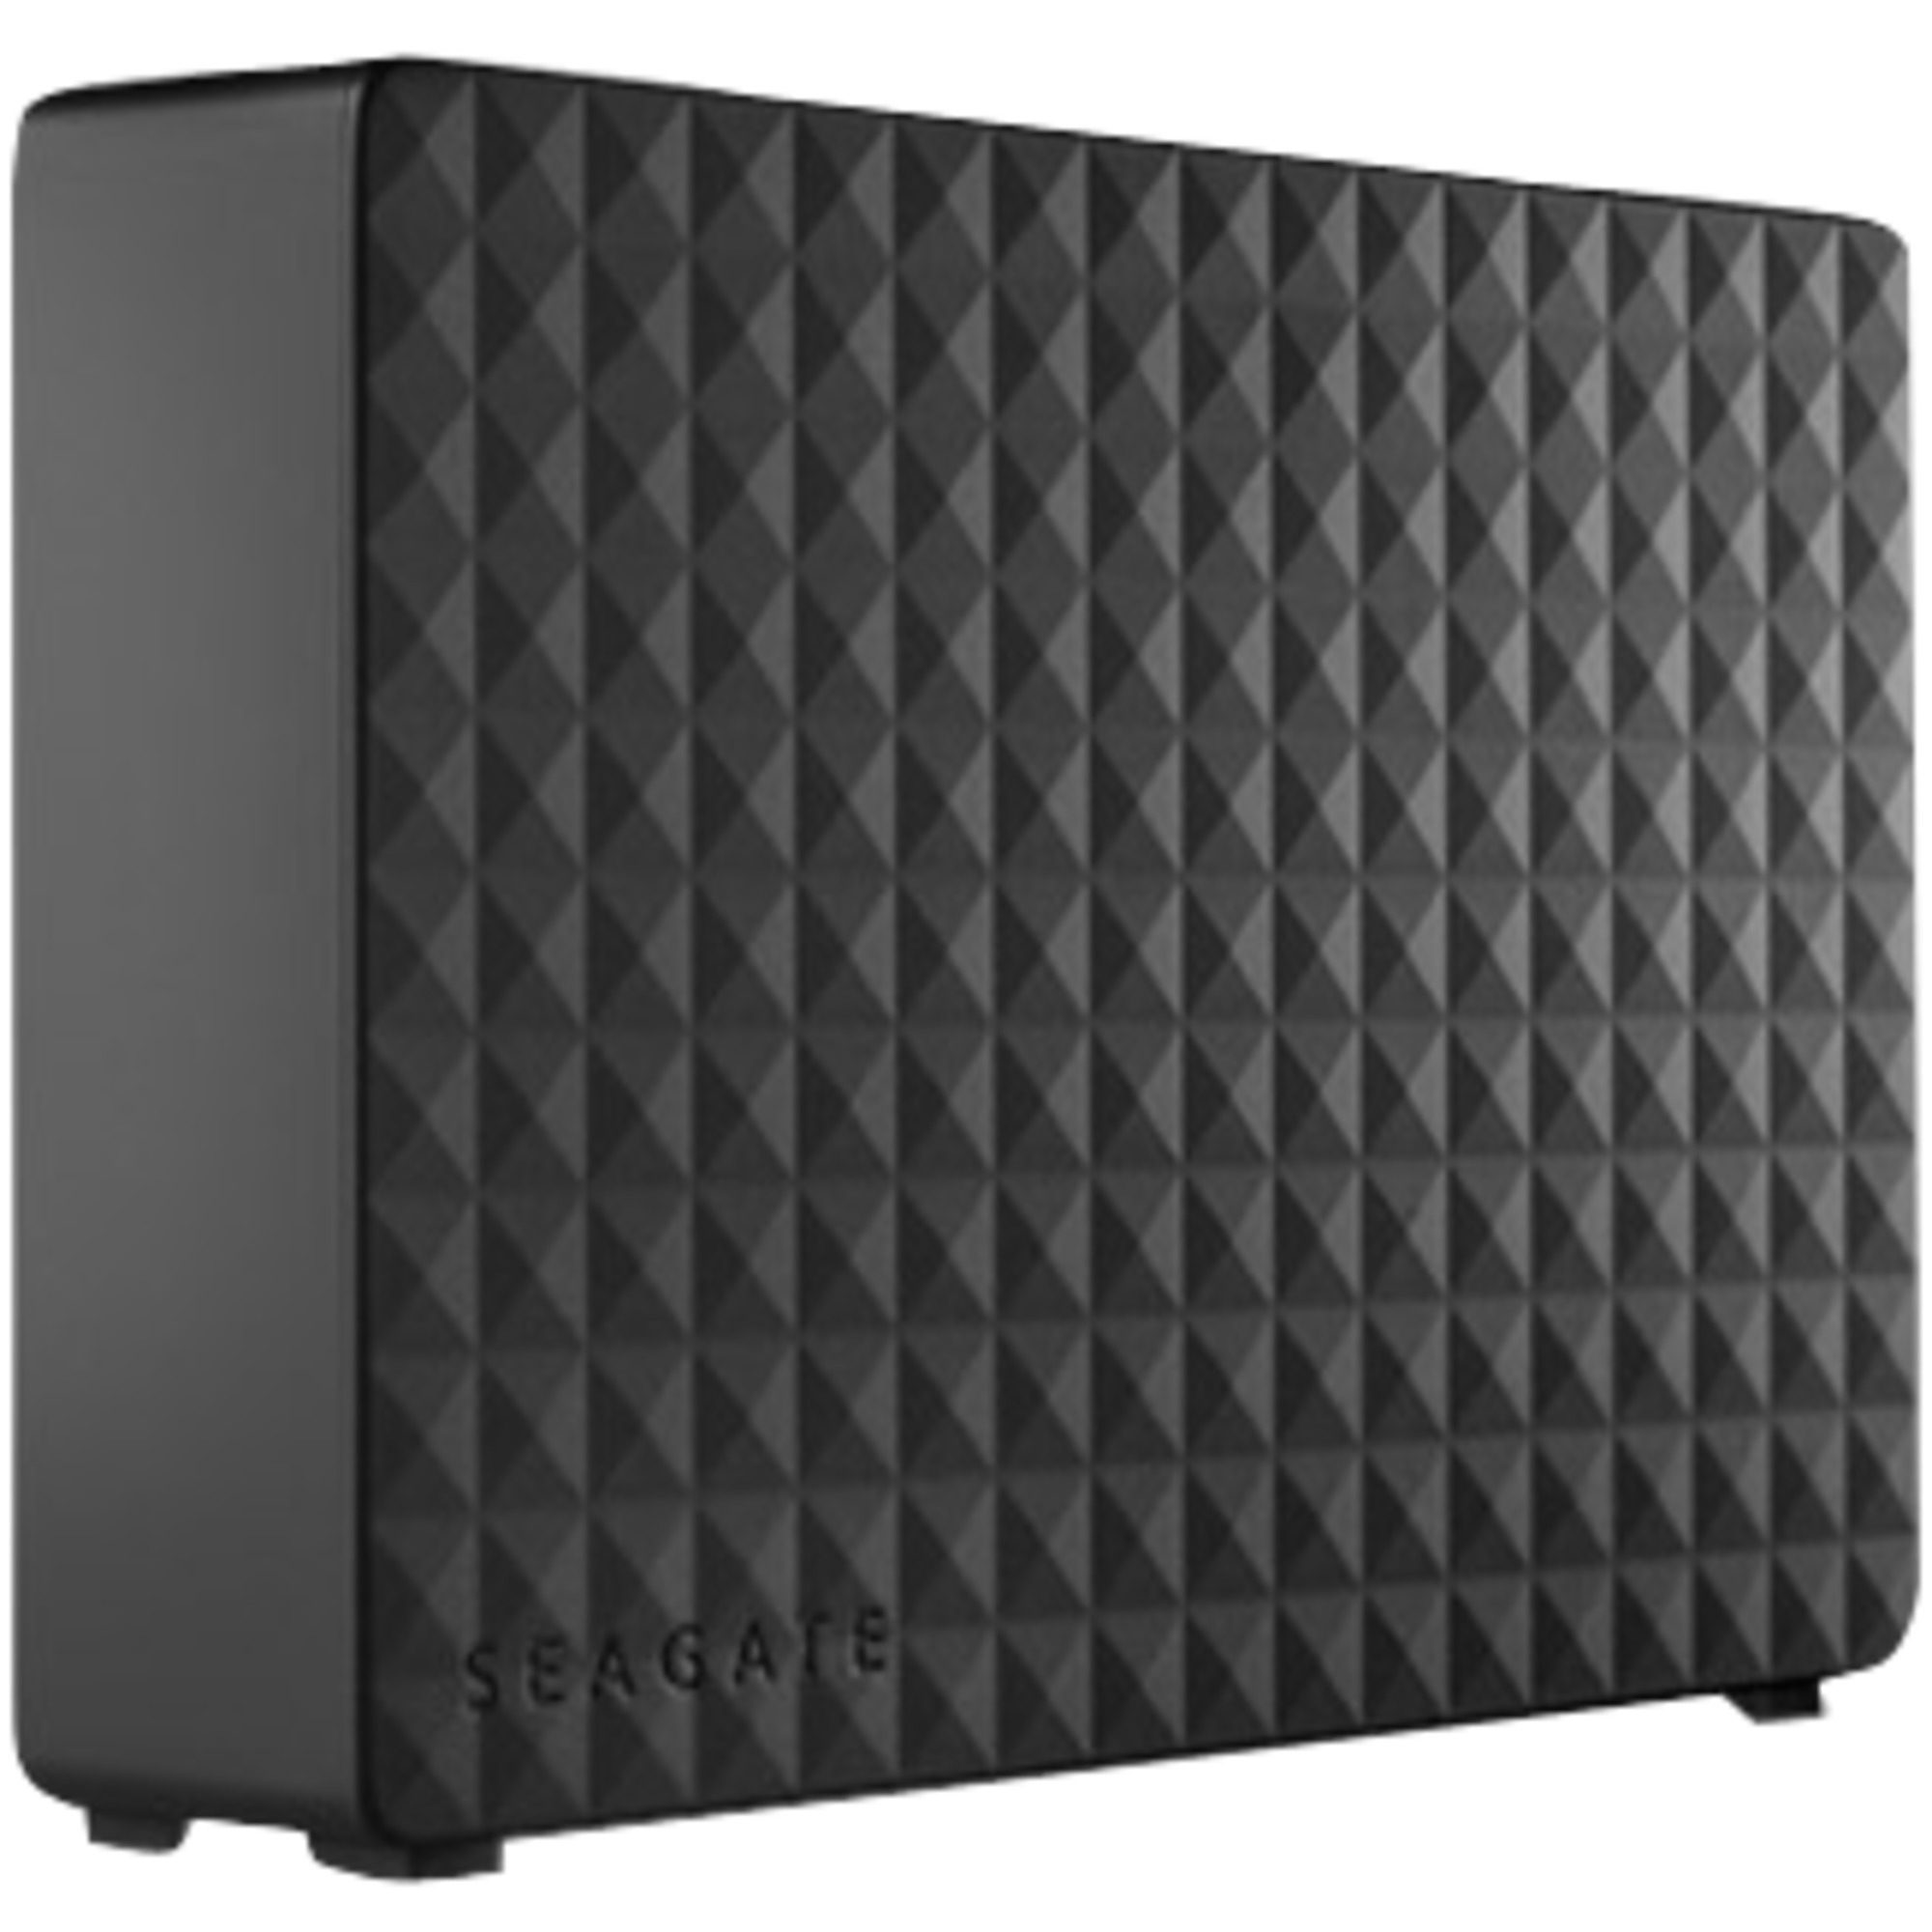 Seagate Festplatte »Expansion Desktop 3 TB«